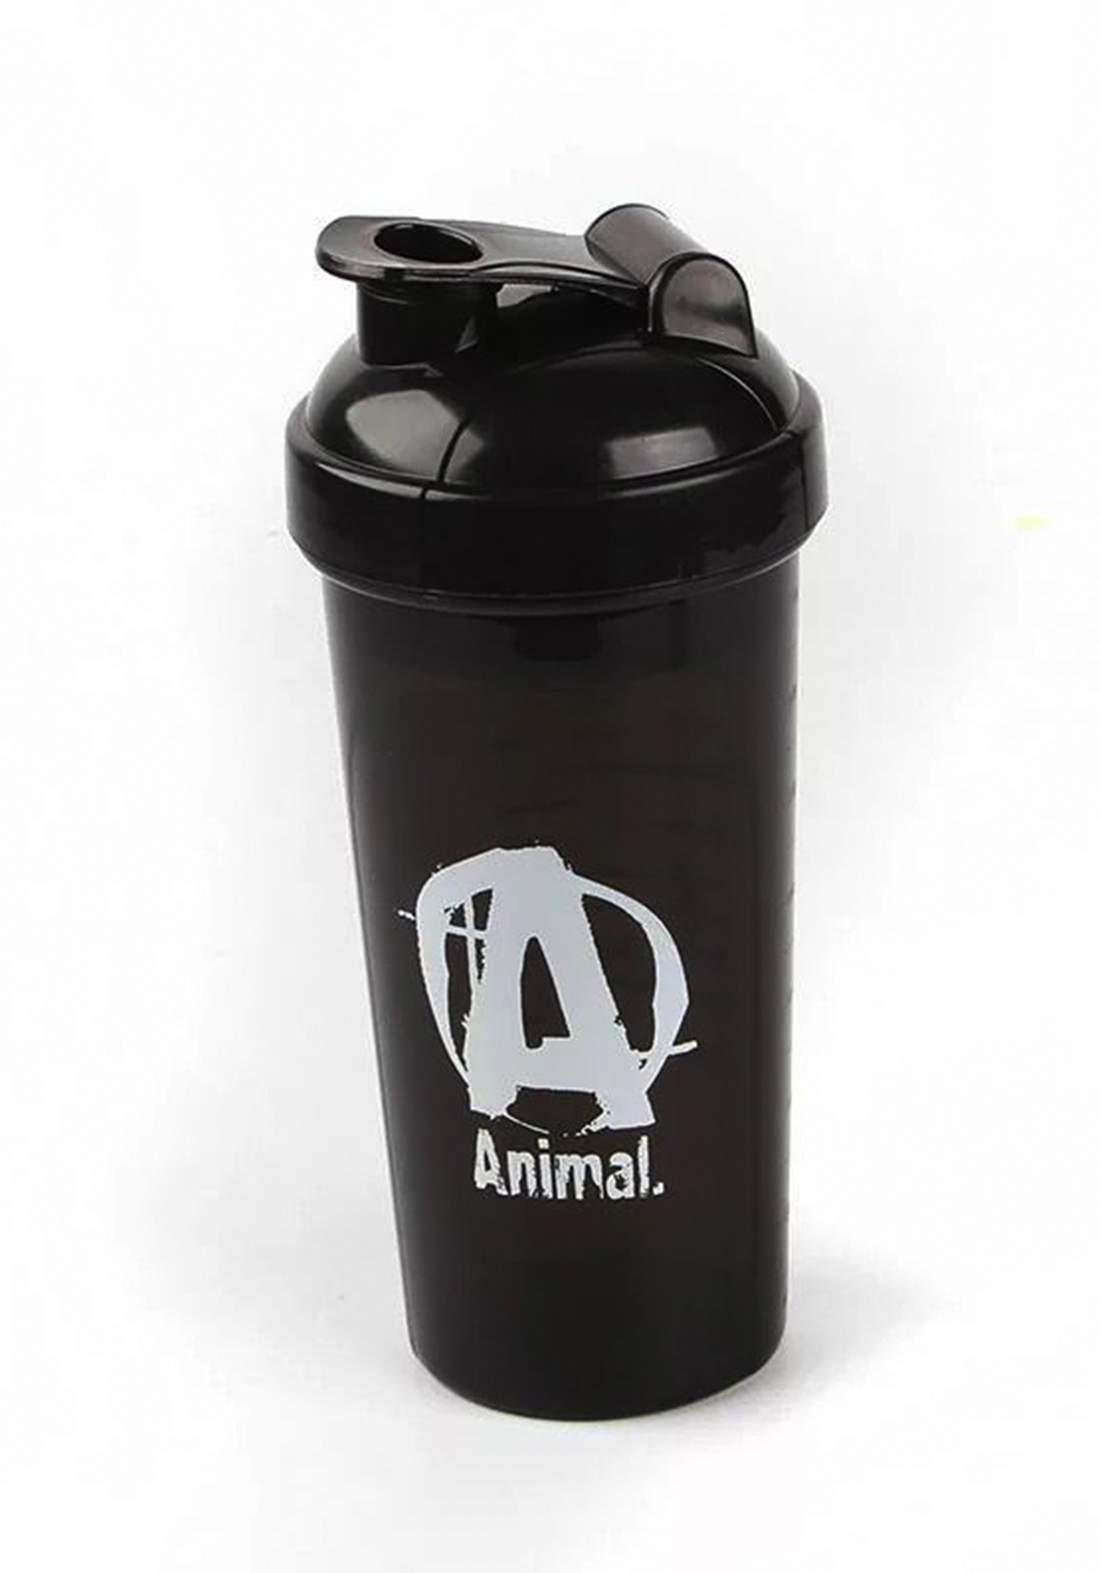 Animal Normal Shaker 400 ml مطارة للرياضيين